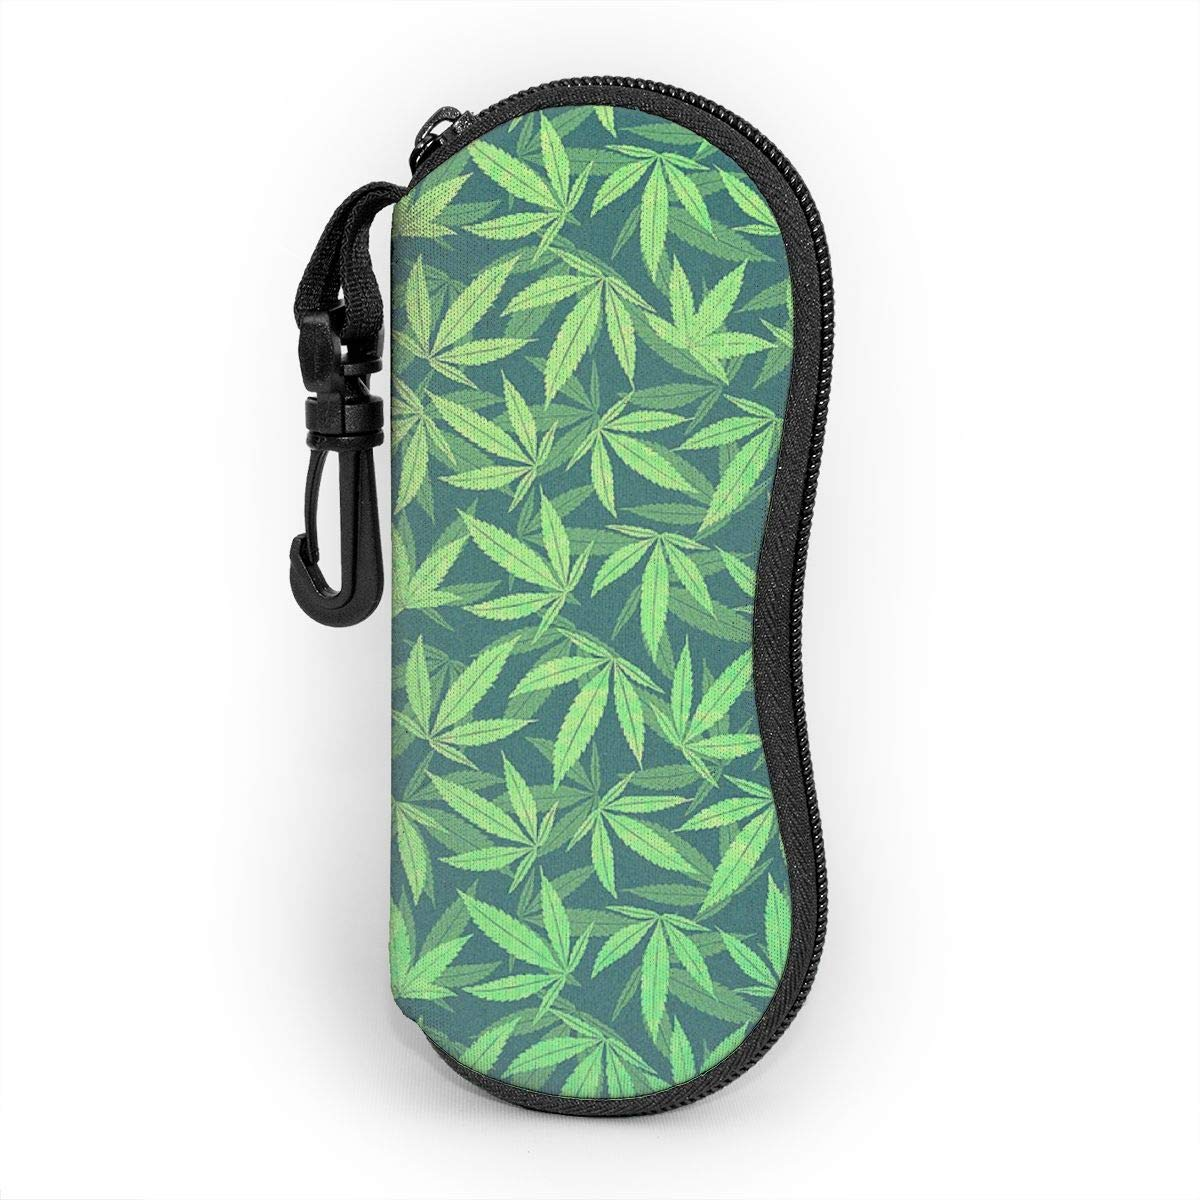 -cannabis-hemp-420-marijuana-pattern-philipp-rietz (1) Glasses Case Soft Case Ultra Light Portable Neoprene Zipper With Carabiner